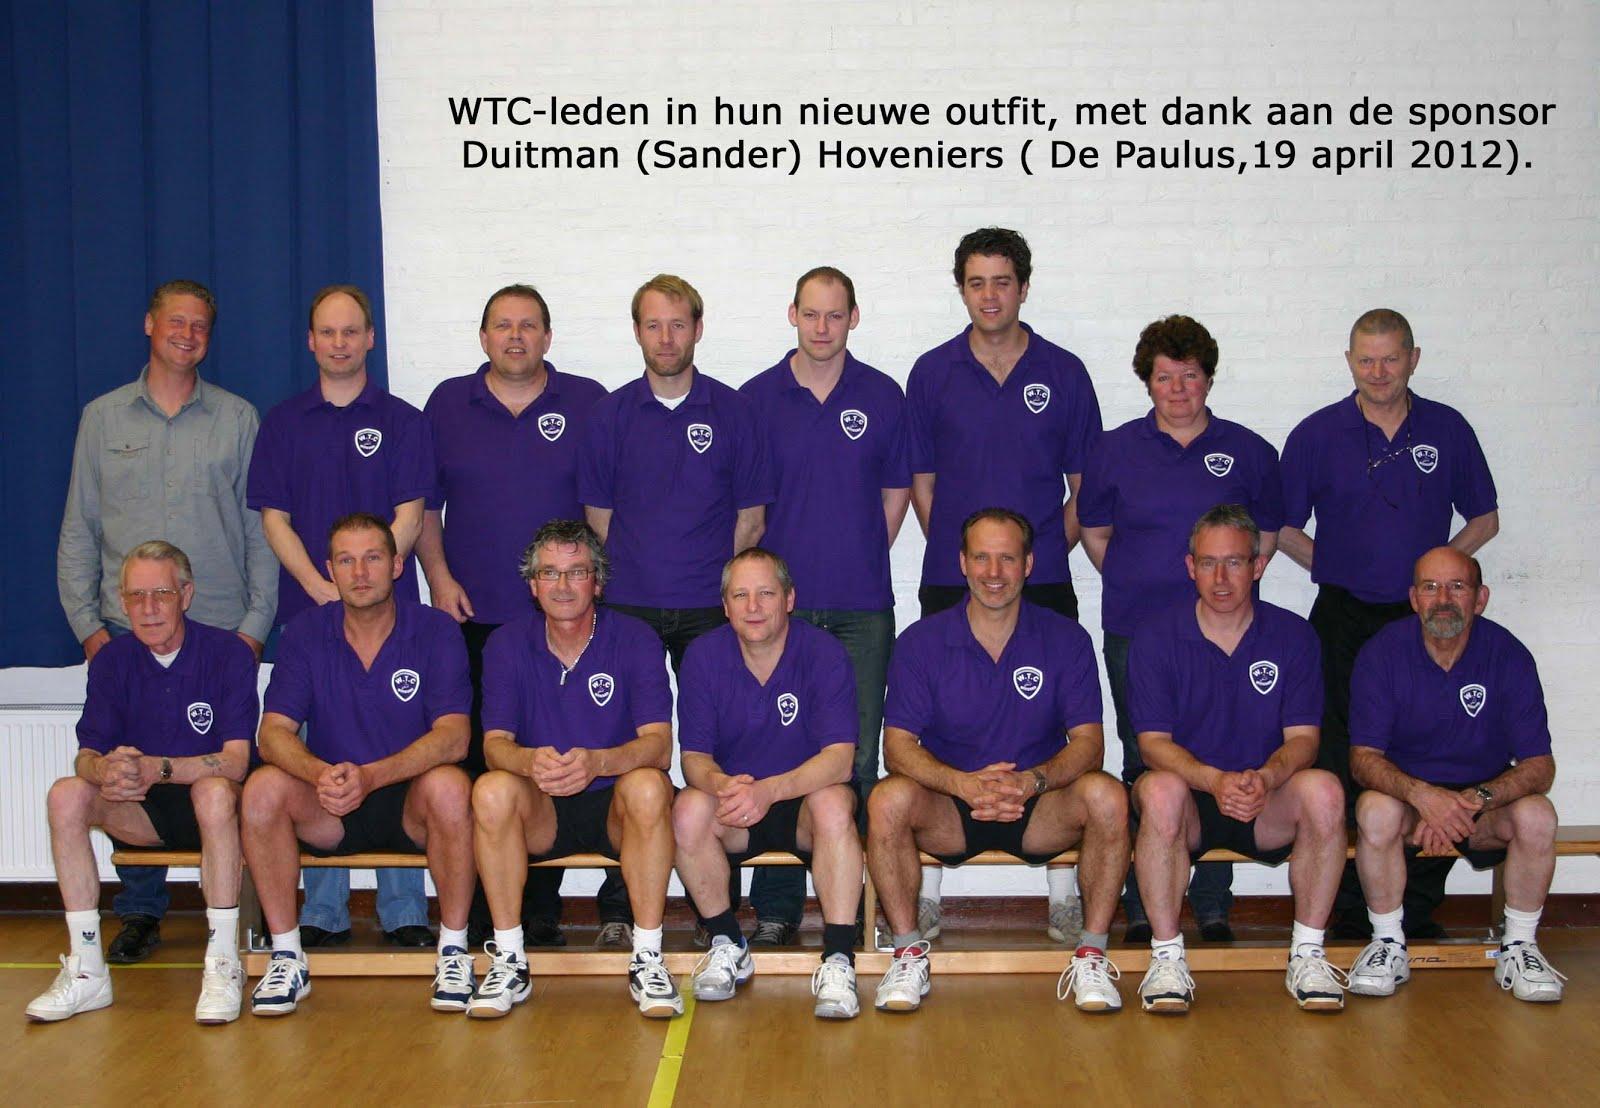 Sander Duitman Hoveniers steekt